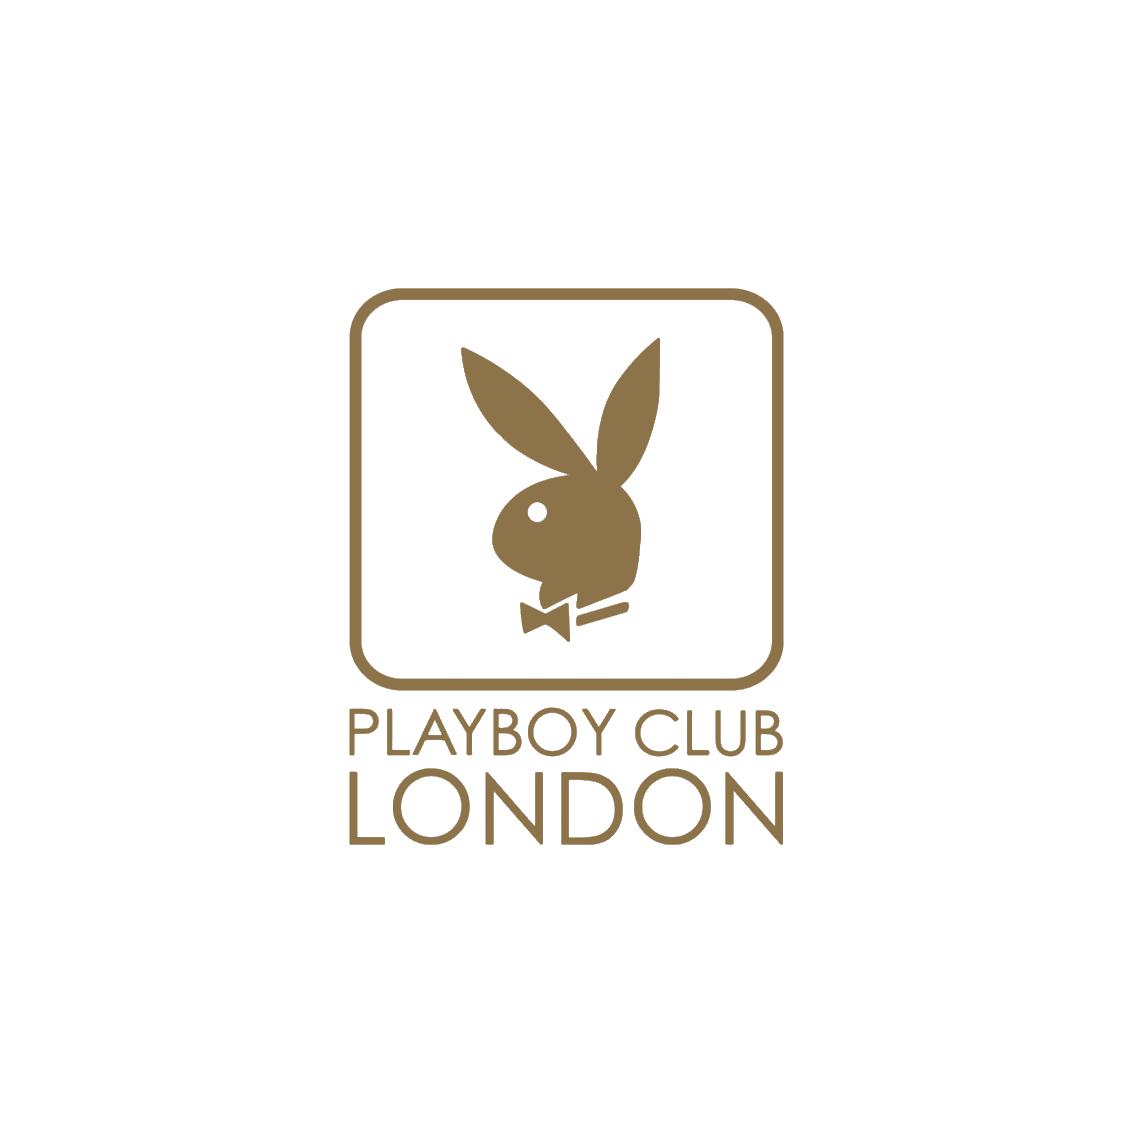 Playboy logo gold.png